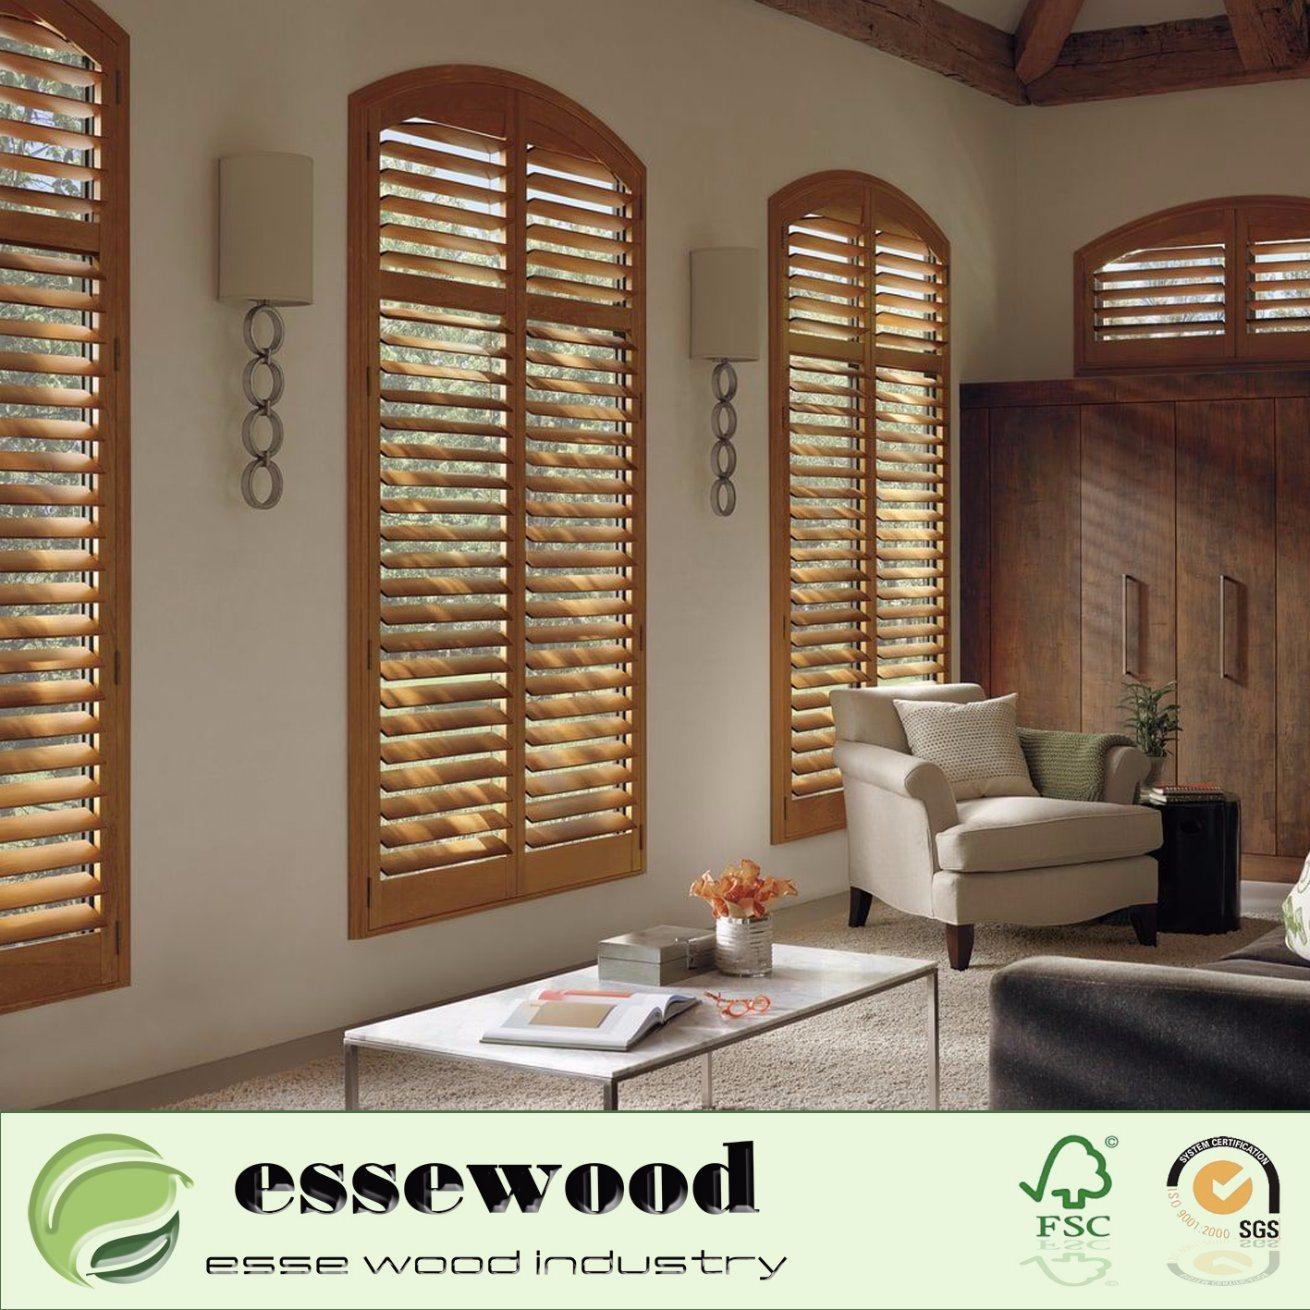 China Basswood Wooden Decorative Window Shutter Plantation